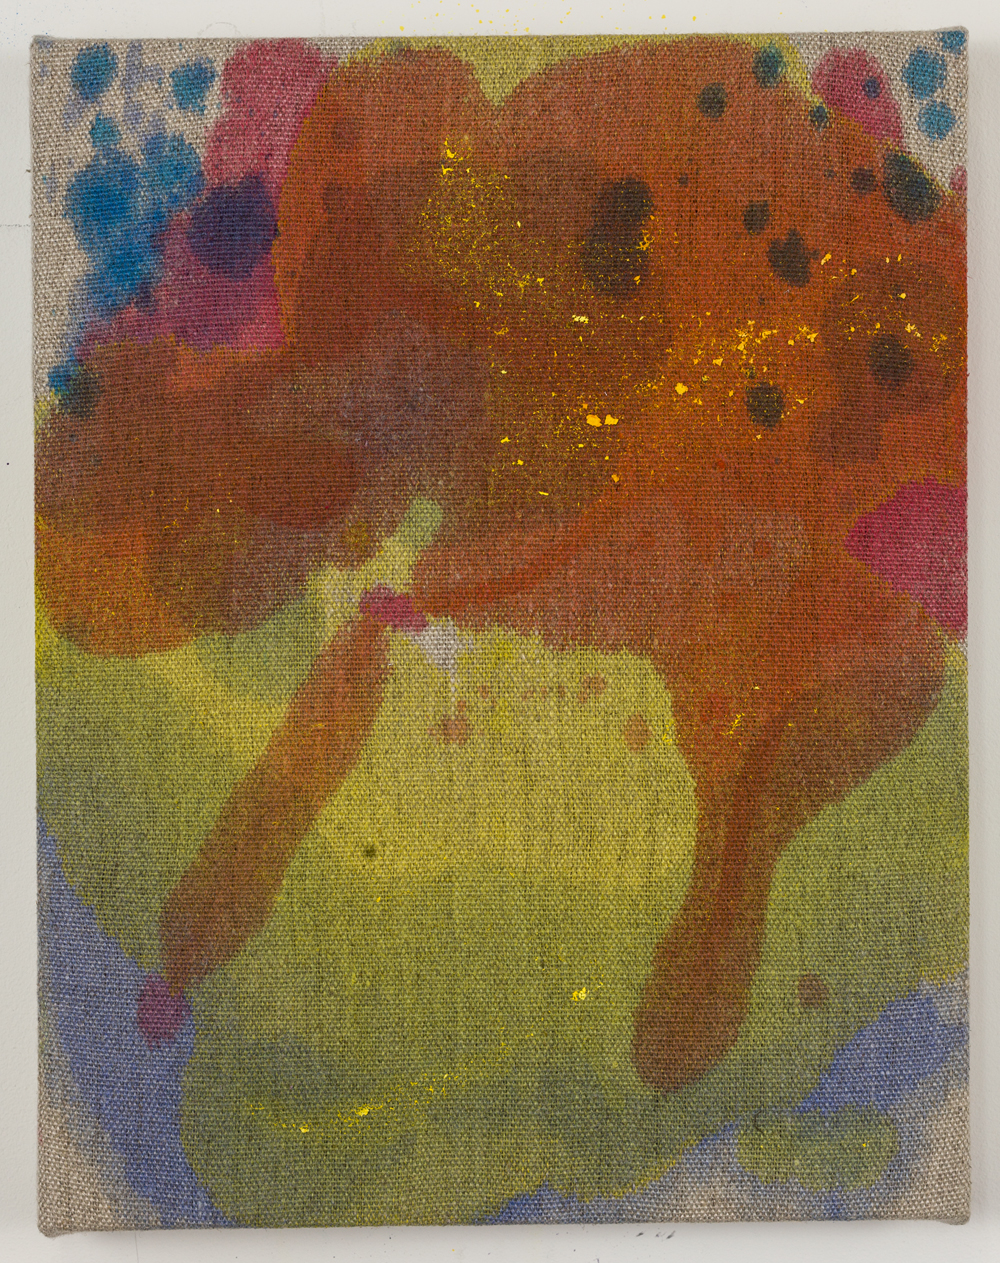 "CMY Blob, acrylic stain on raw linen, 14"" x 11"", 2016"